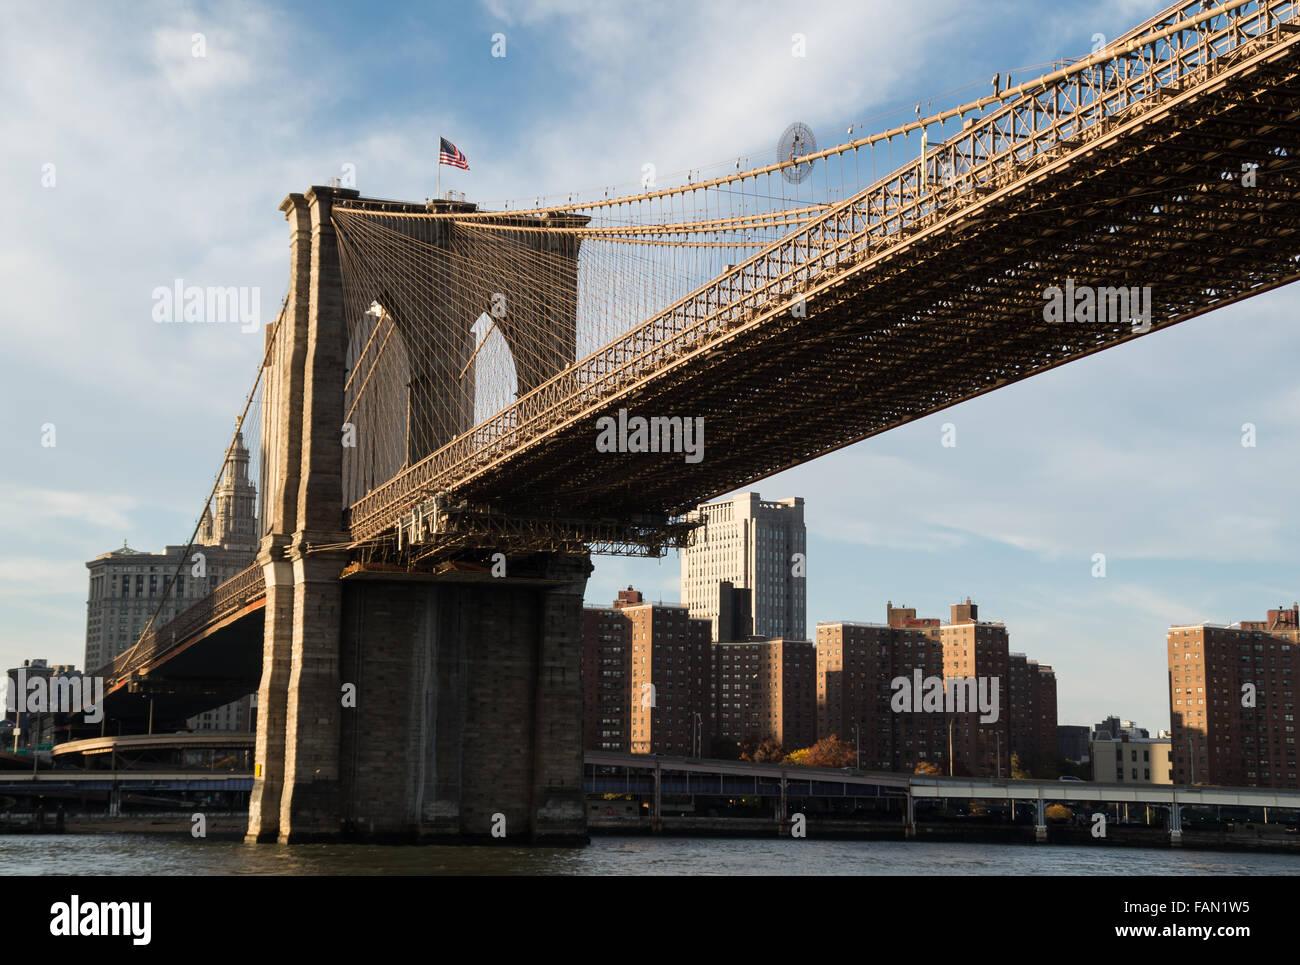 Brooklyn Bridge entering Manhattan with an American flag flying - Stock Image